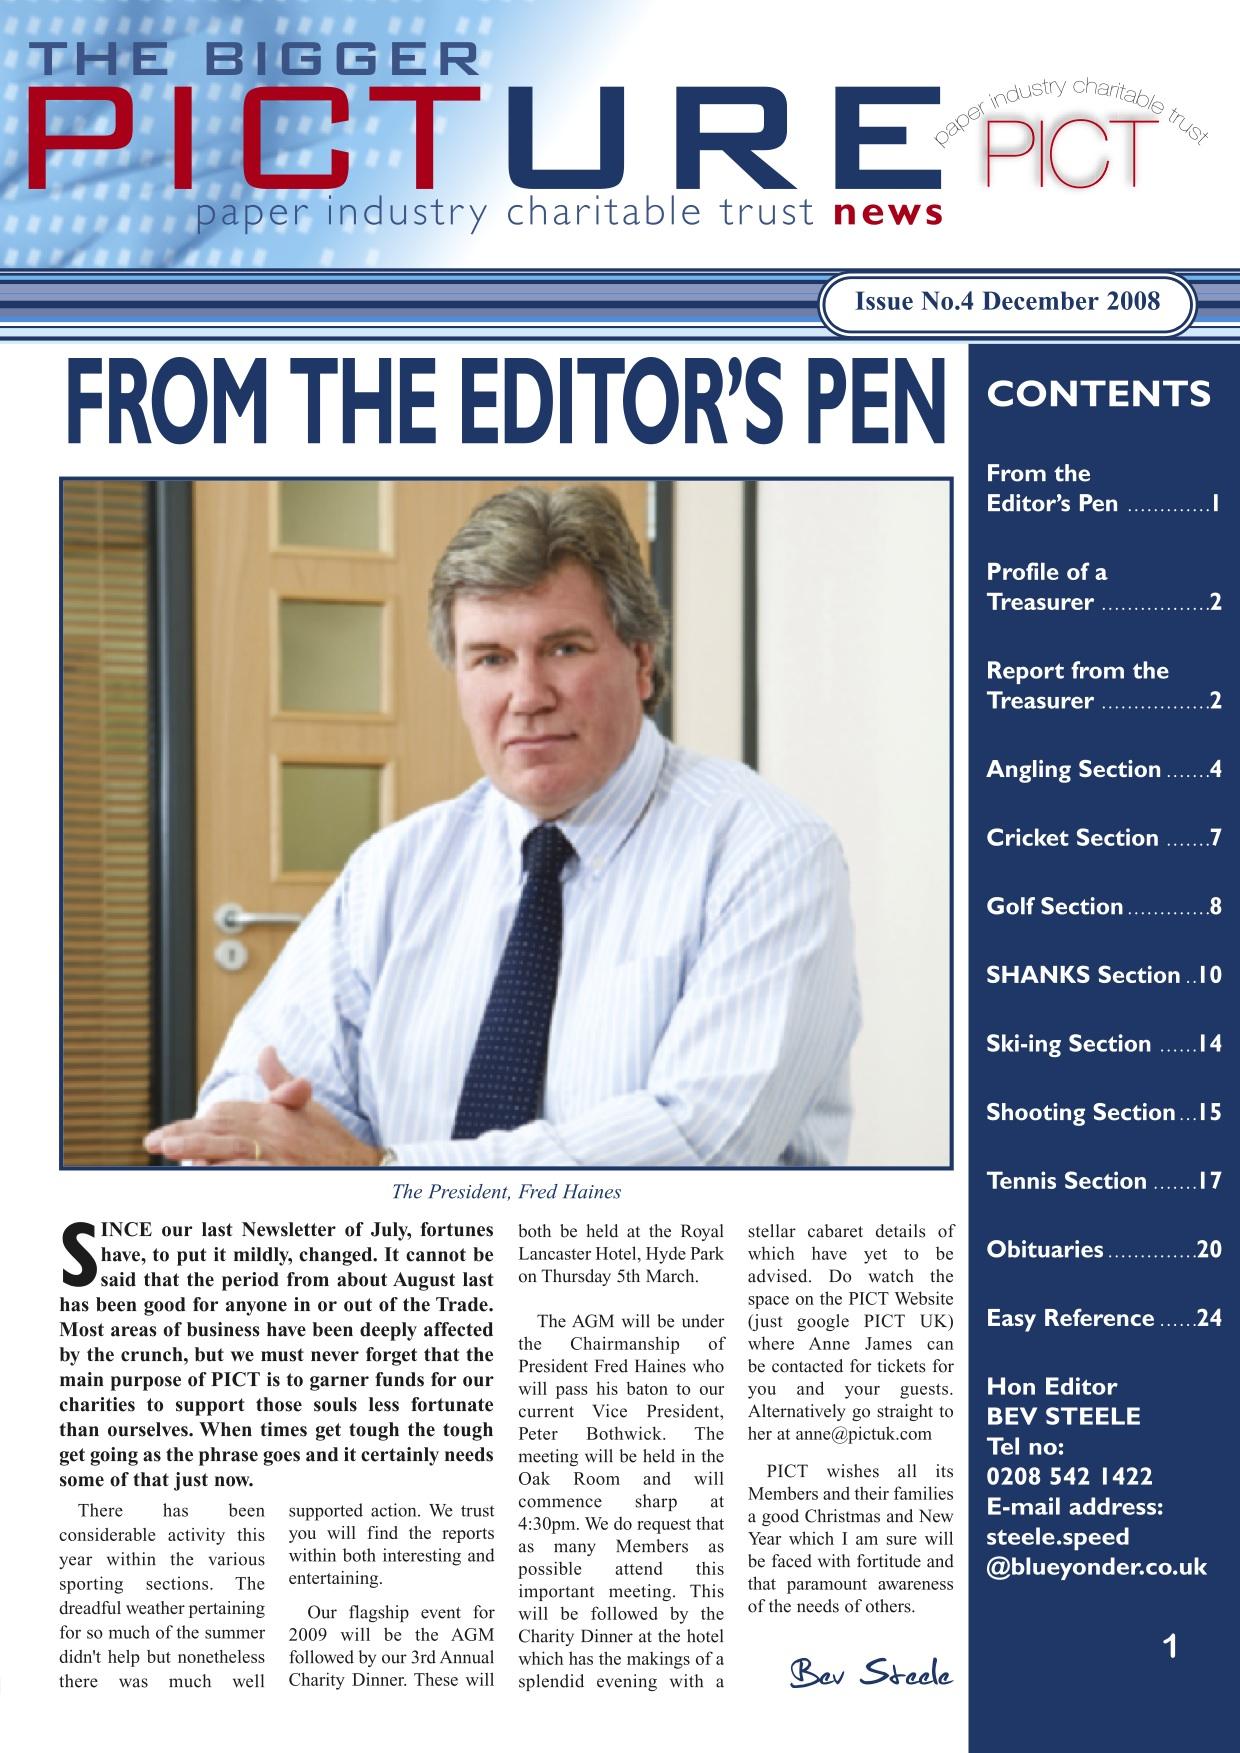 Issue 4 - December 2008